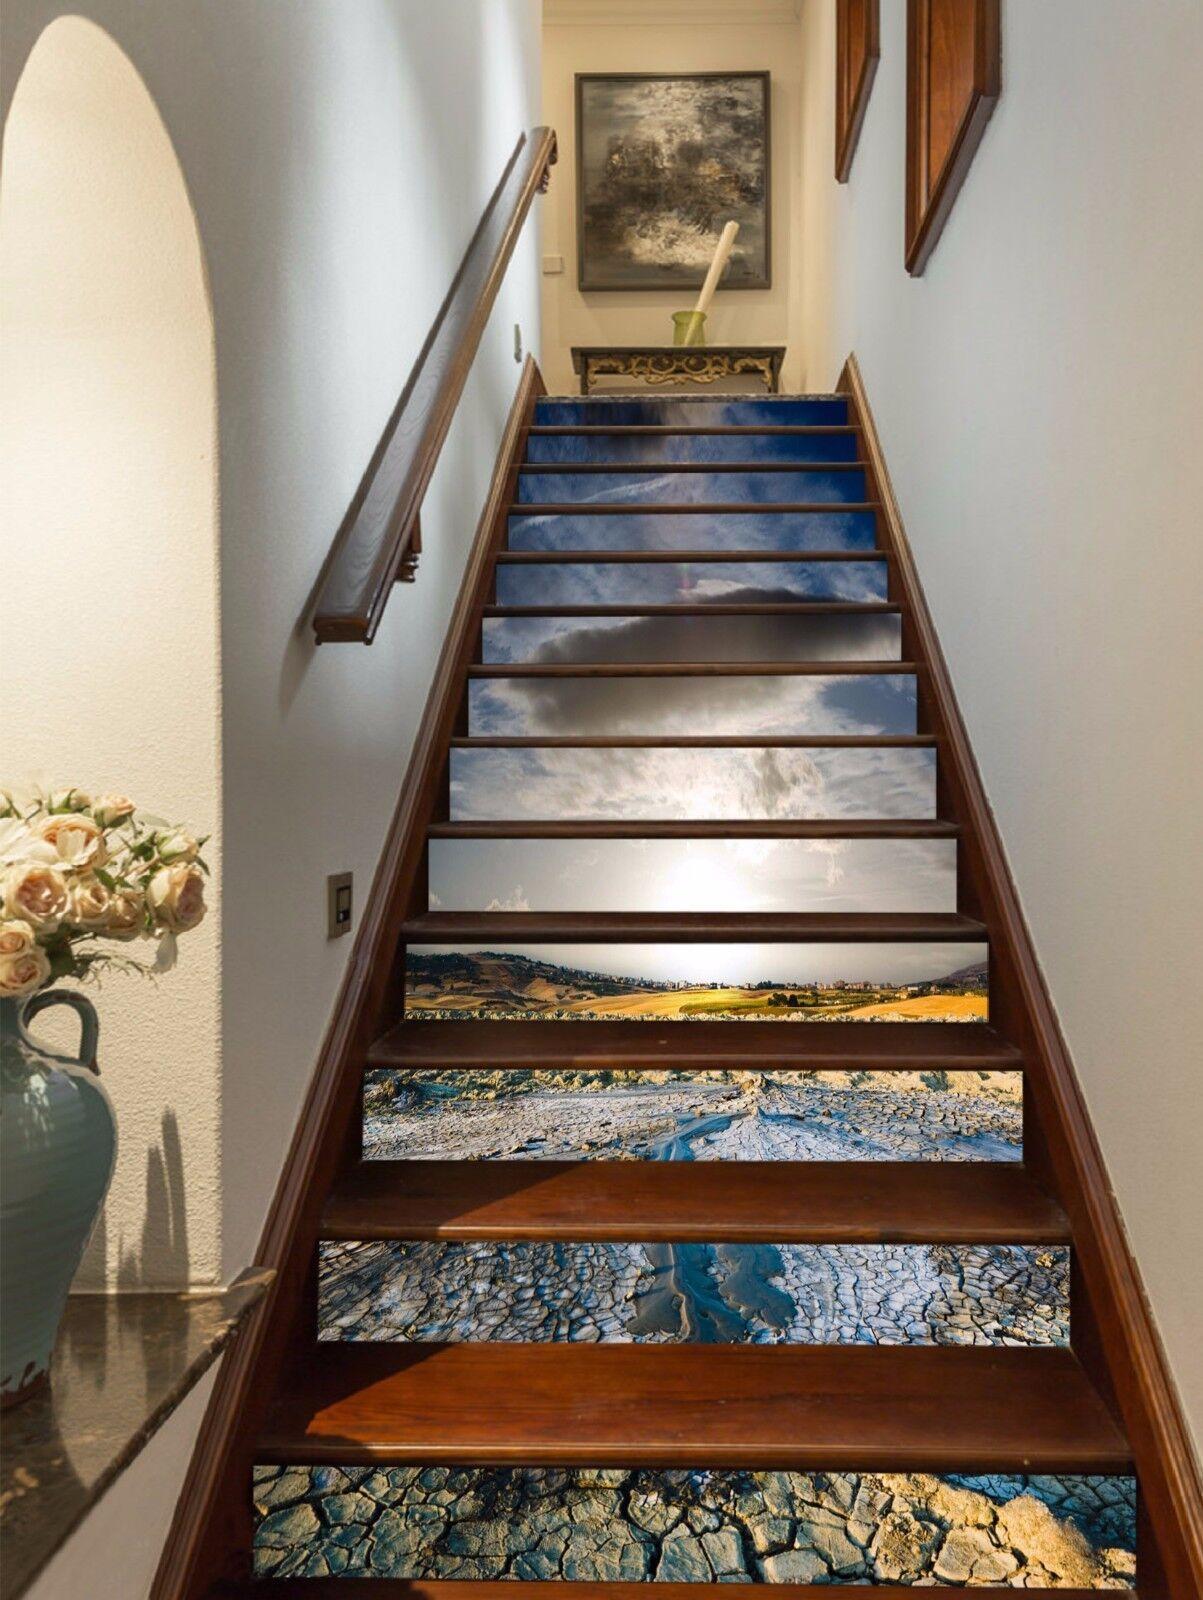 3D Drought Land 514 Stair Risers Decoration Photo Mural Vinyl Decal Wallpaper UK